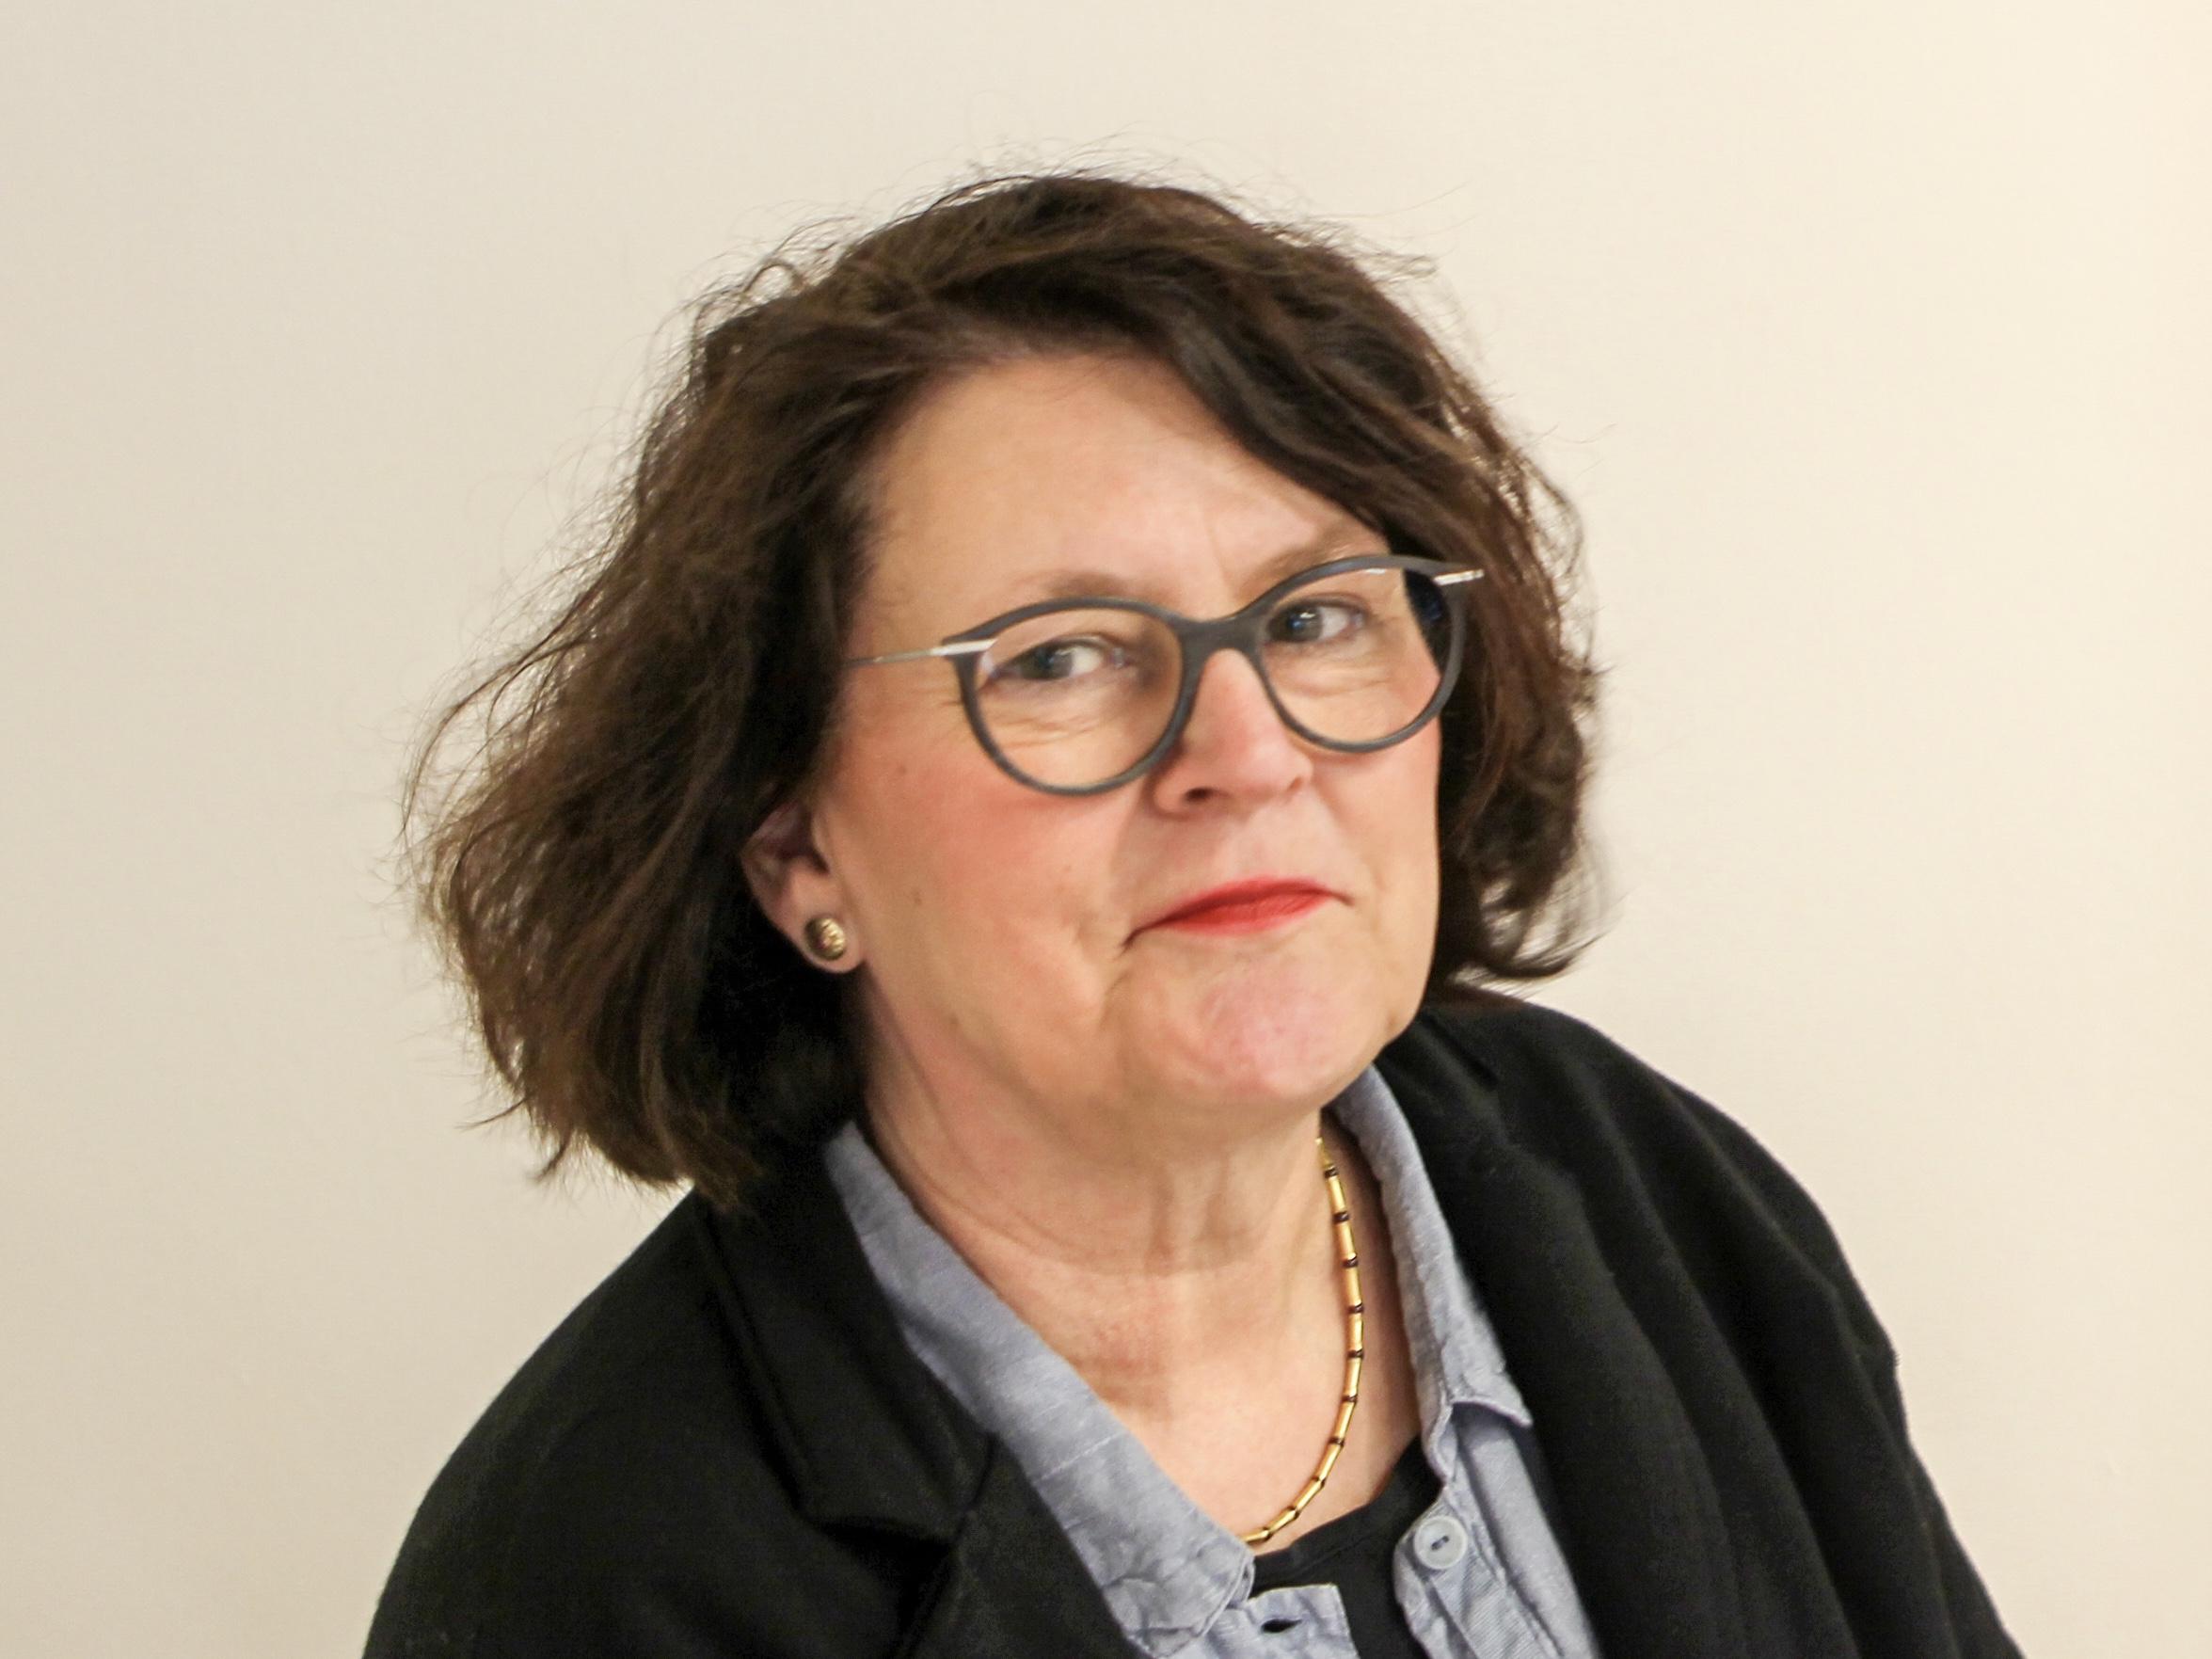 Katharina Worring